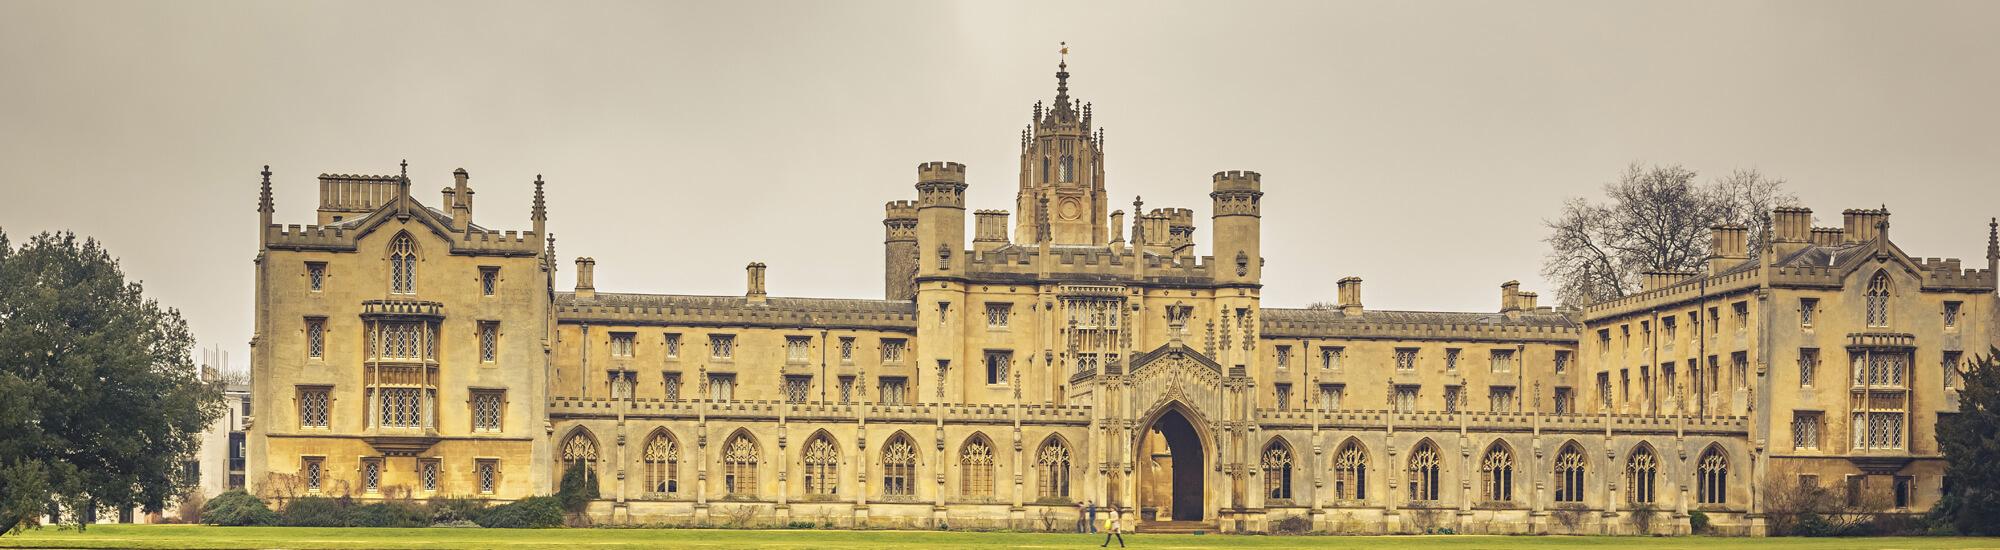 Cambridge Tour